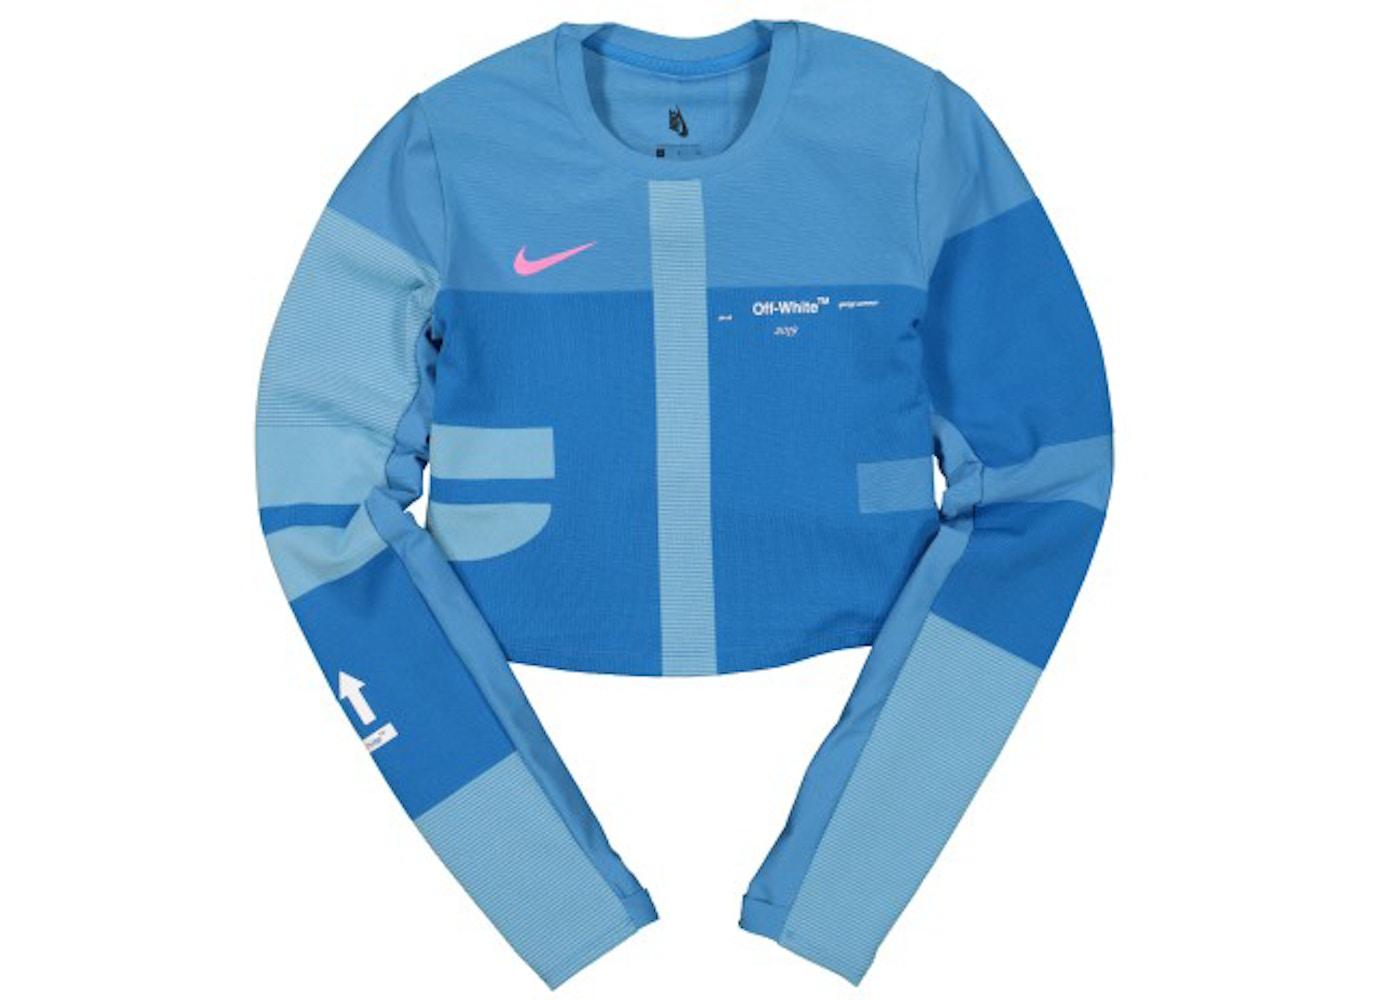 OFF-WHITE x Nike Women's Easy Run Top Photo Blue